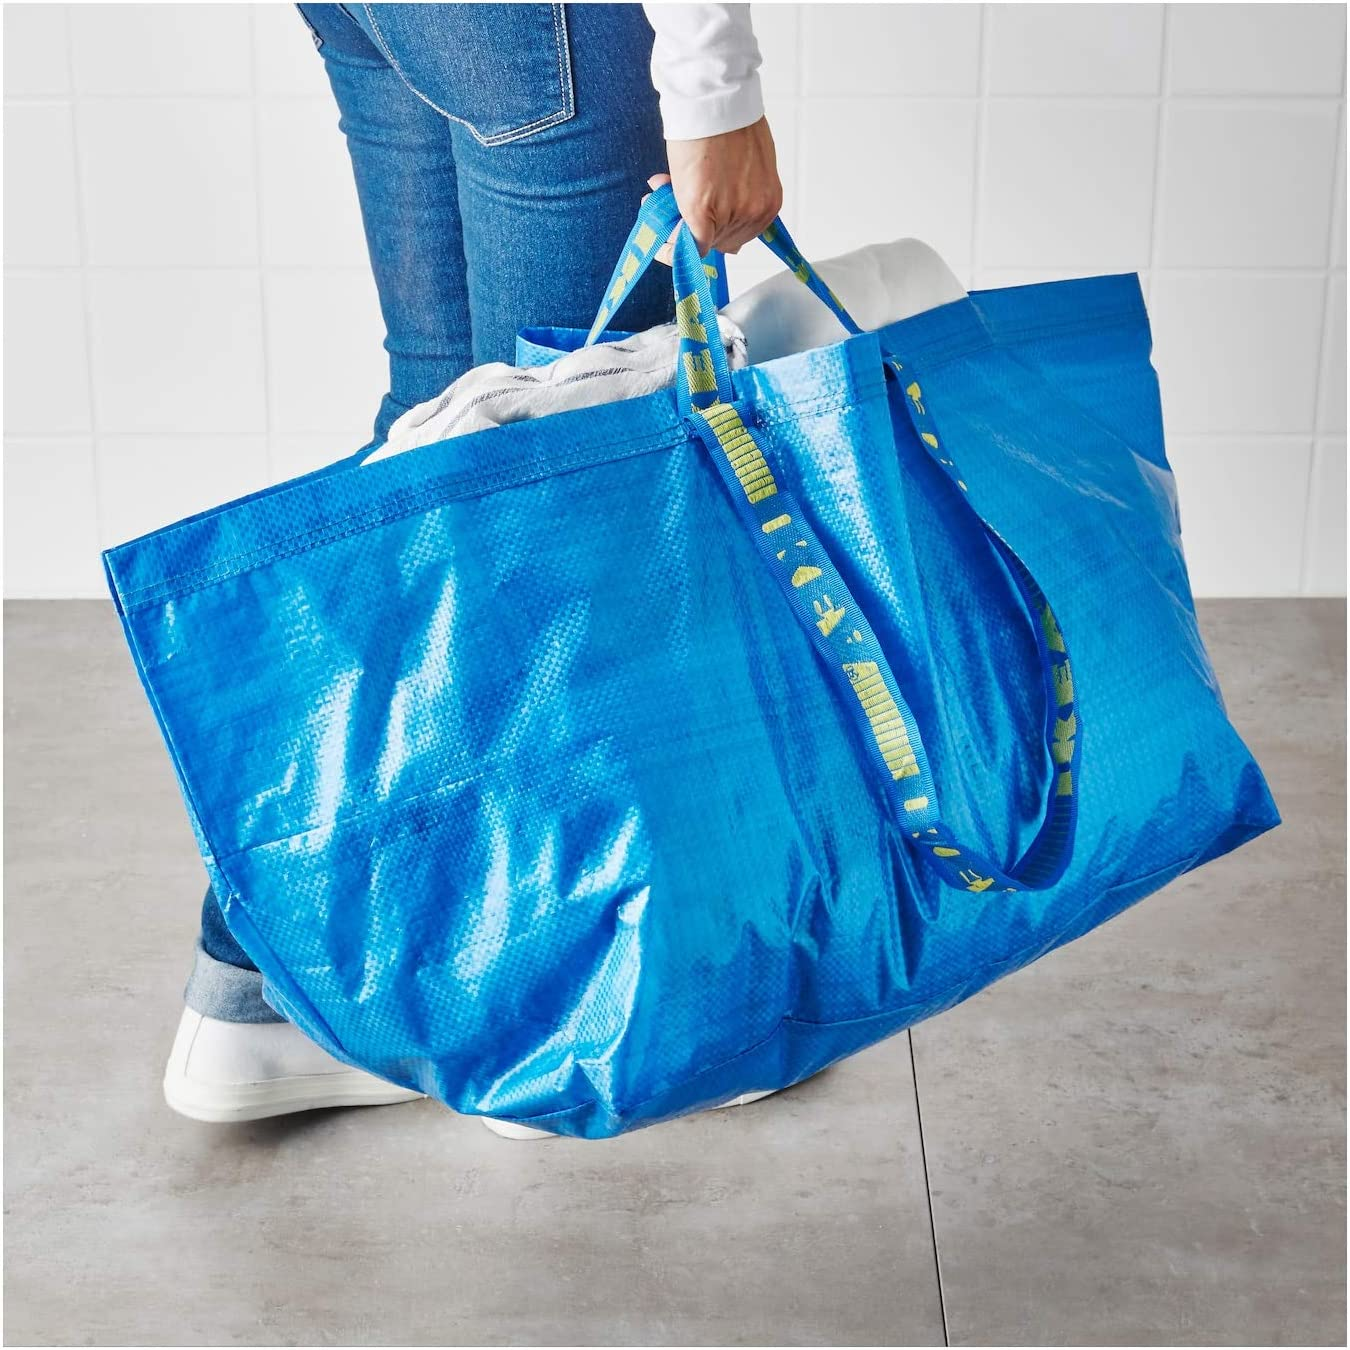 6 unidades color azul Bolsa para la ropa sucia FRAKTA BLUE